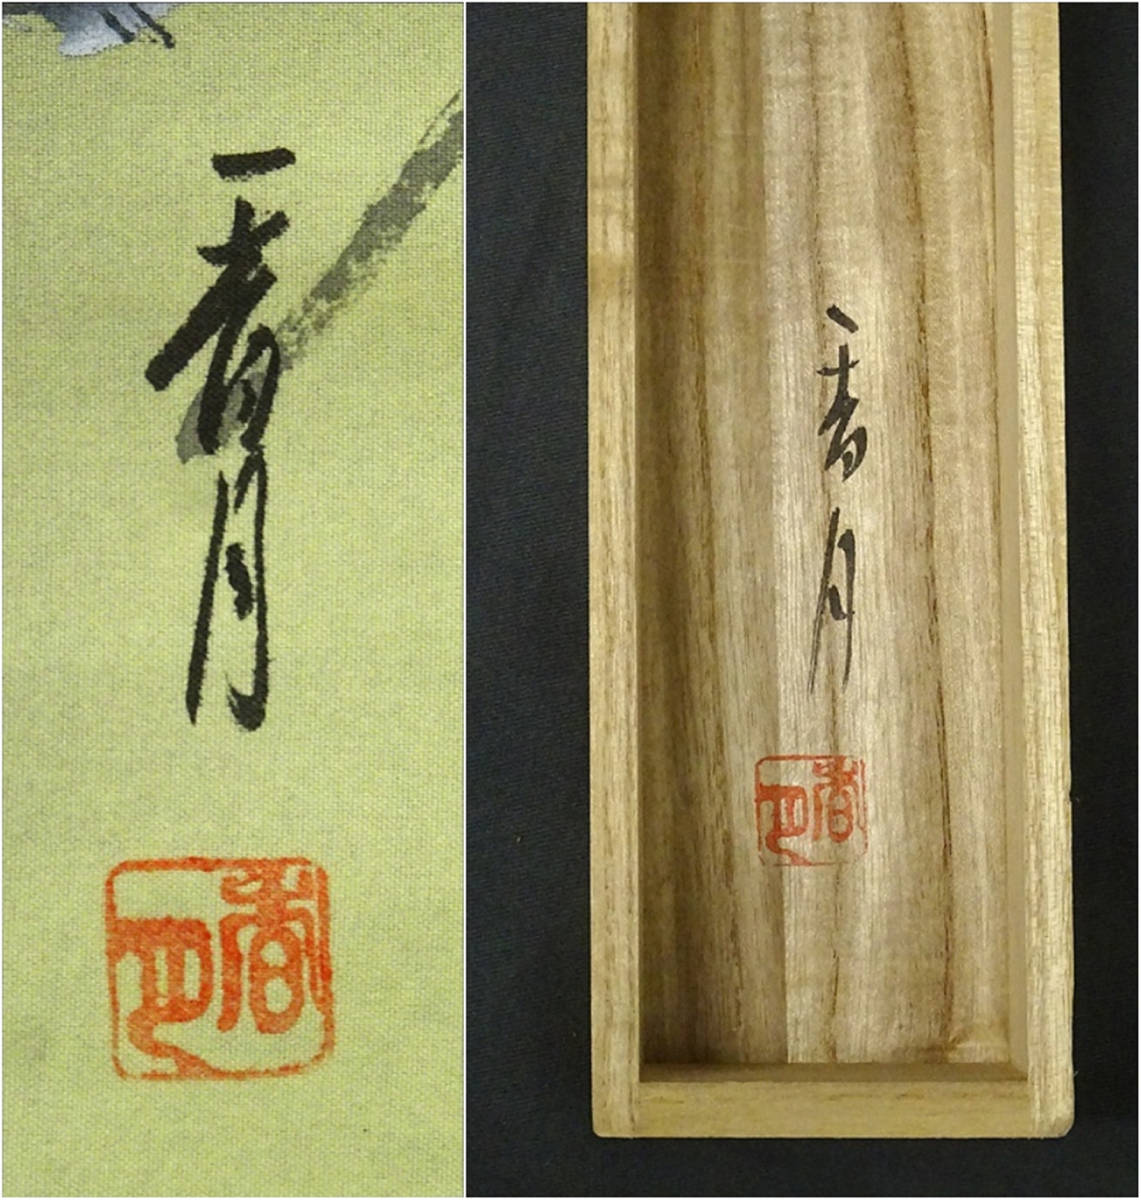 掛軸 香月『梅に鴬』絹本 共箱付 掛け軸 w061711_画像7